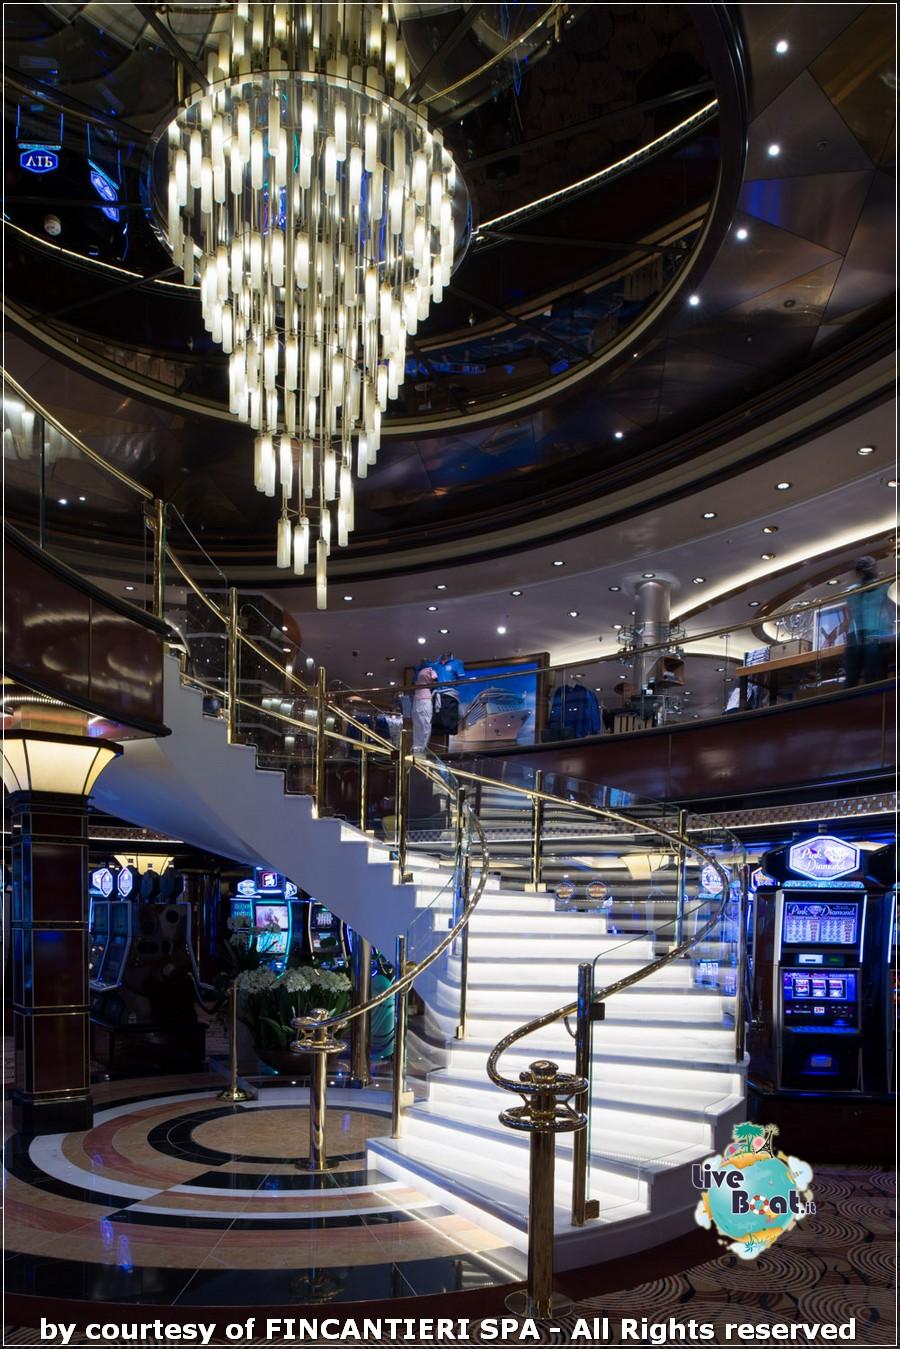 Foto nave Regal Princess-10regalprincess-fiincantieri-princesscruises-jpg